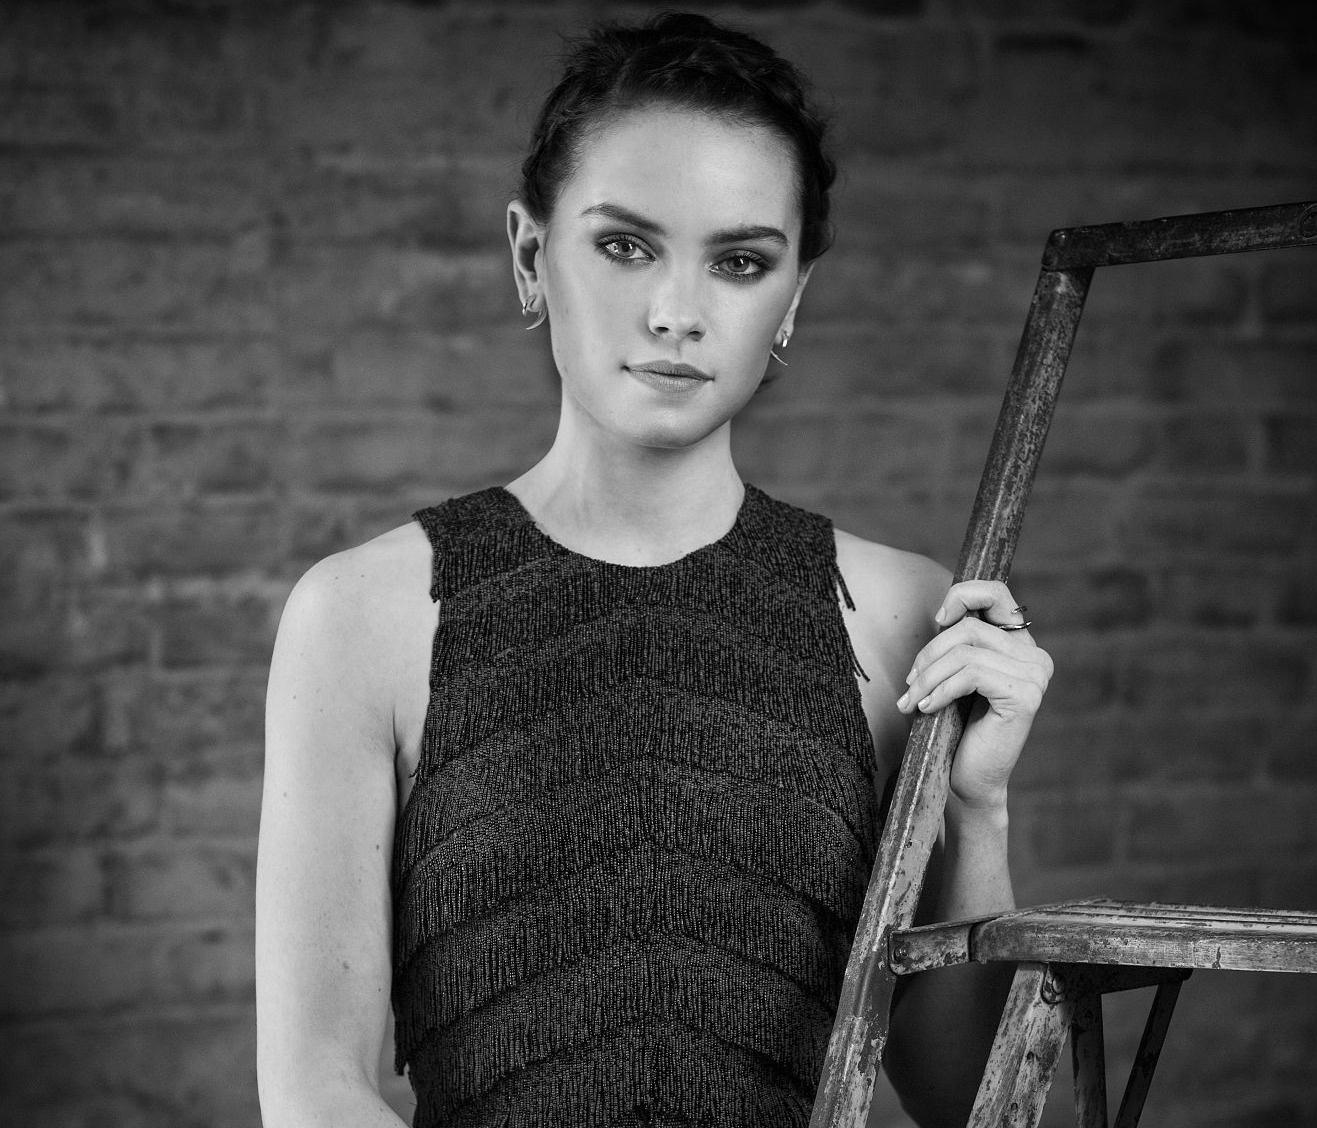 Daisy Ridley by Sarah Dunn for Empire Magazine June 2016